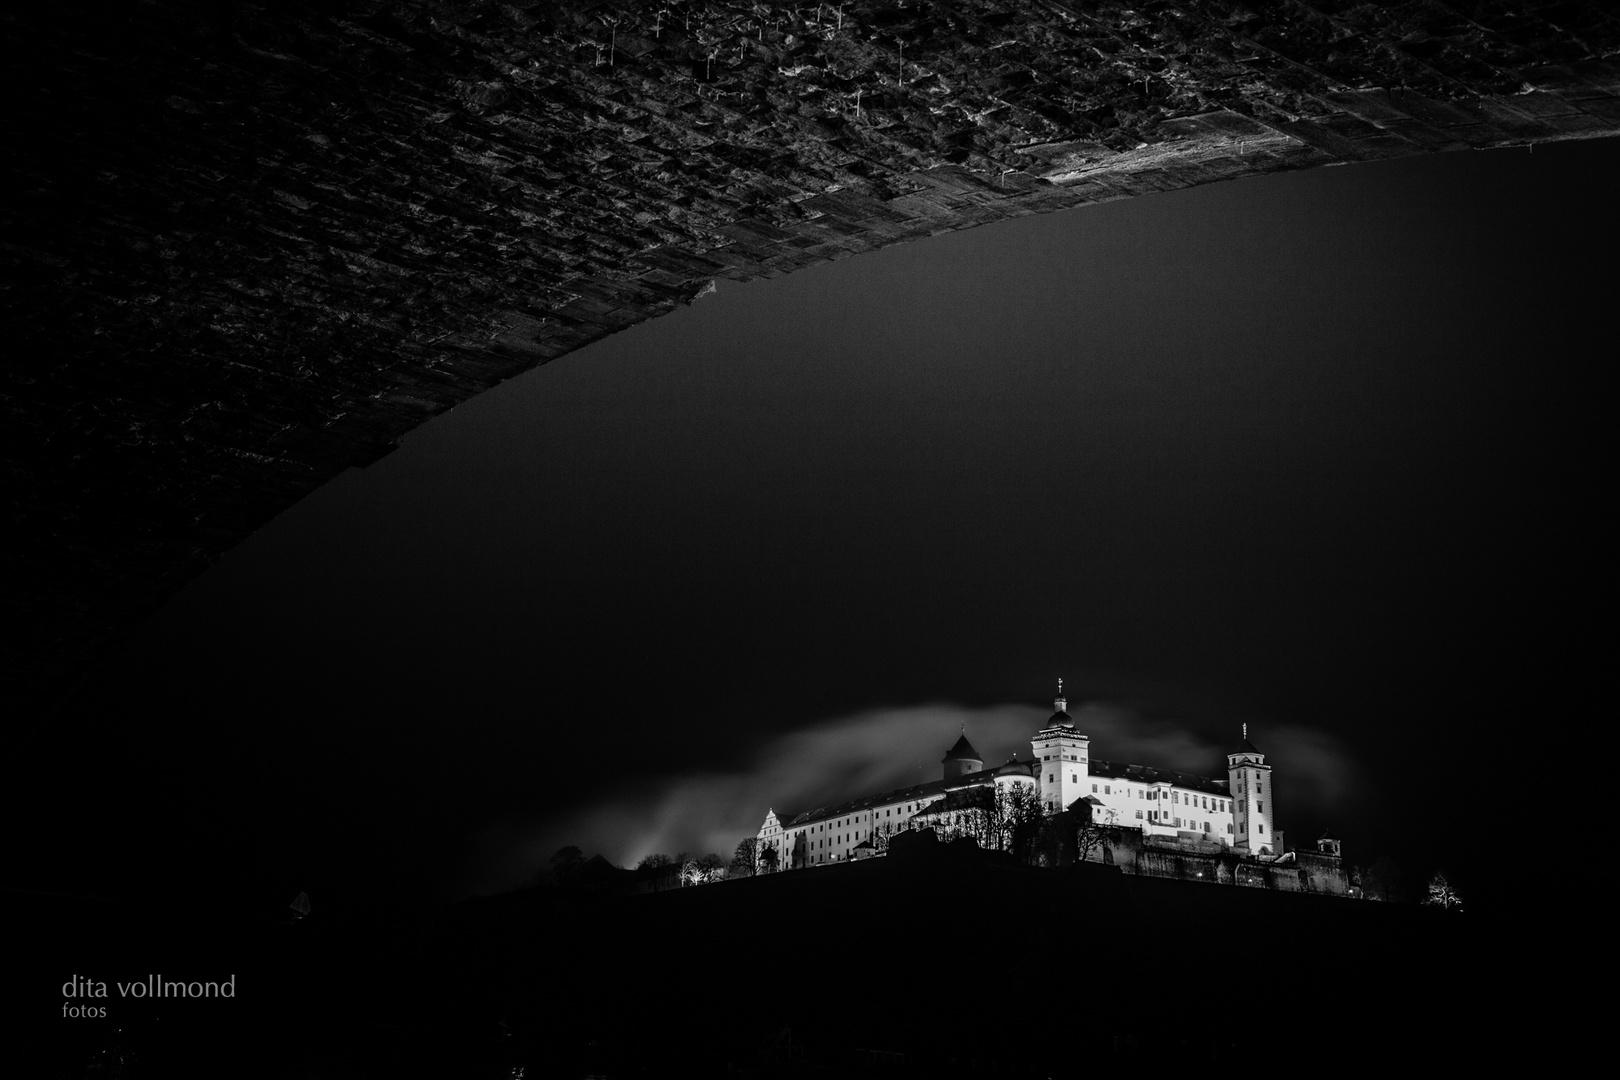 Würzburg s/w Festung